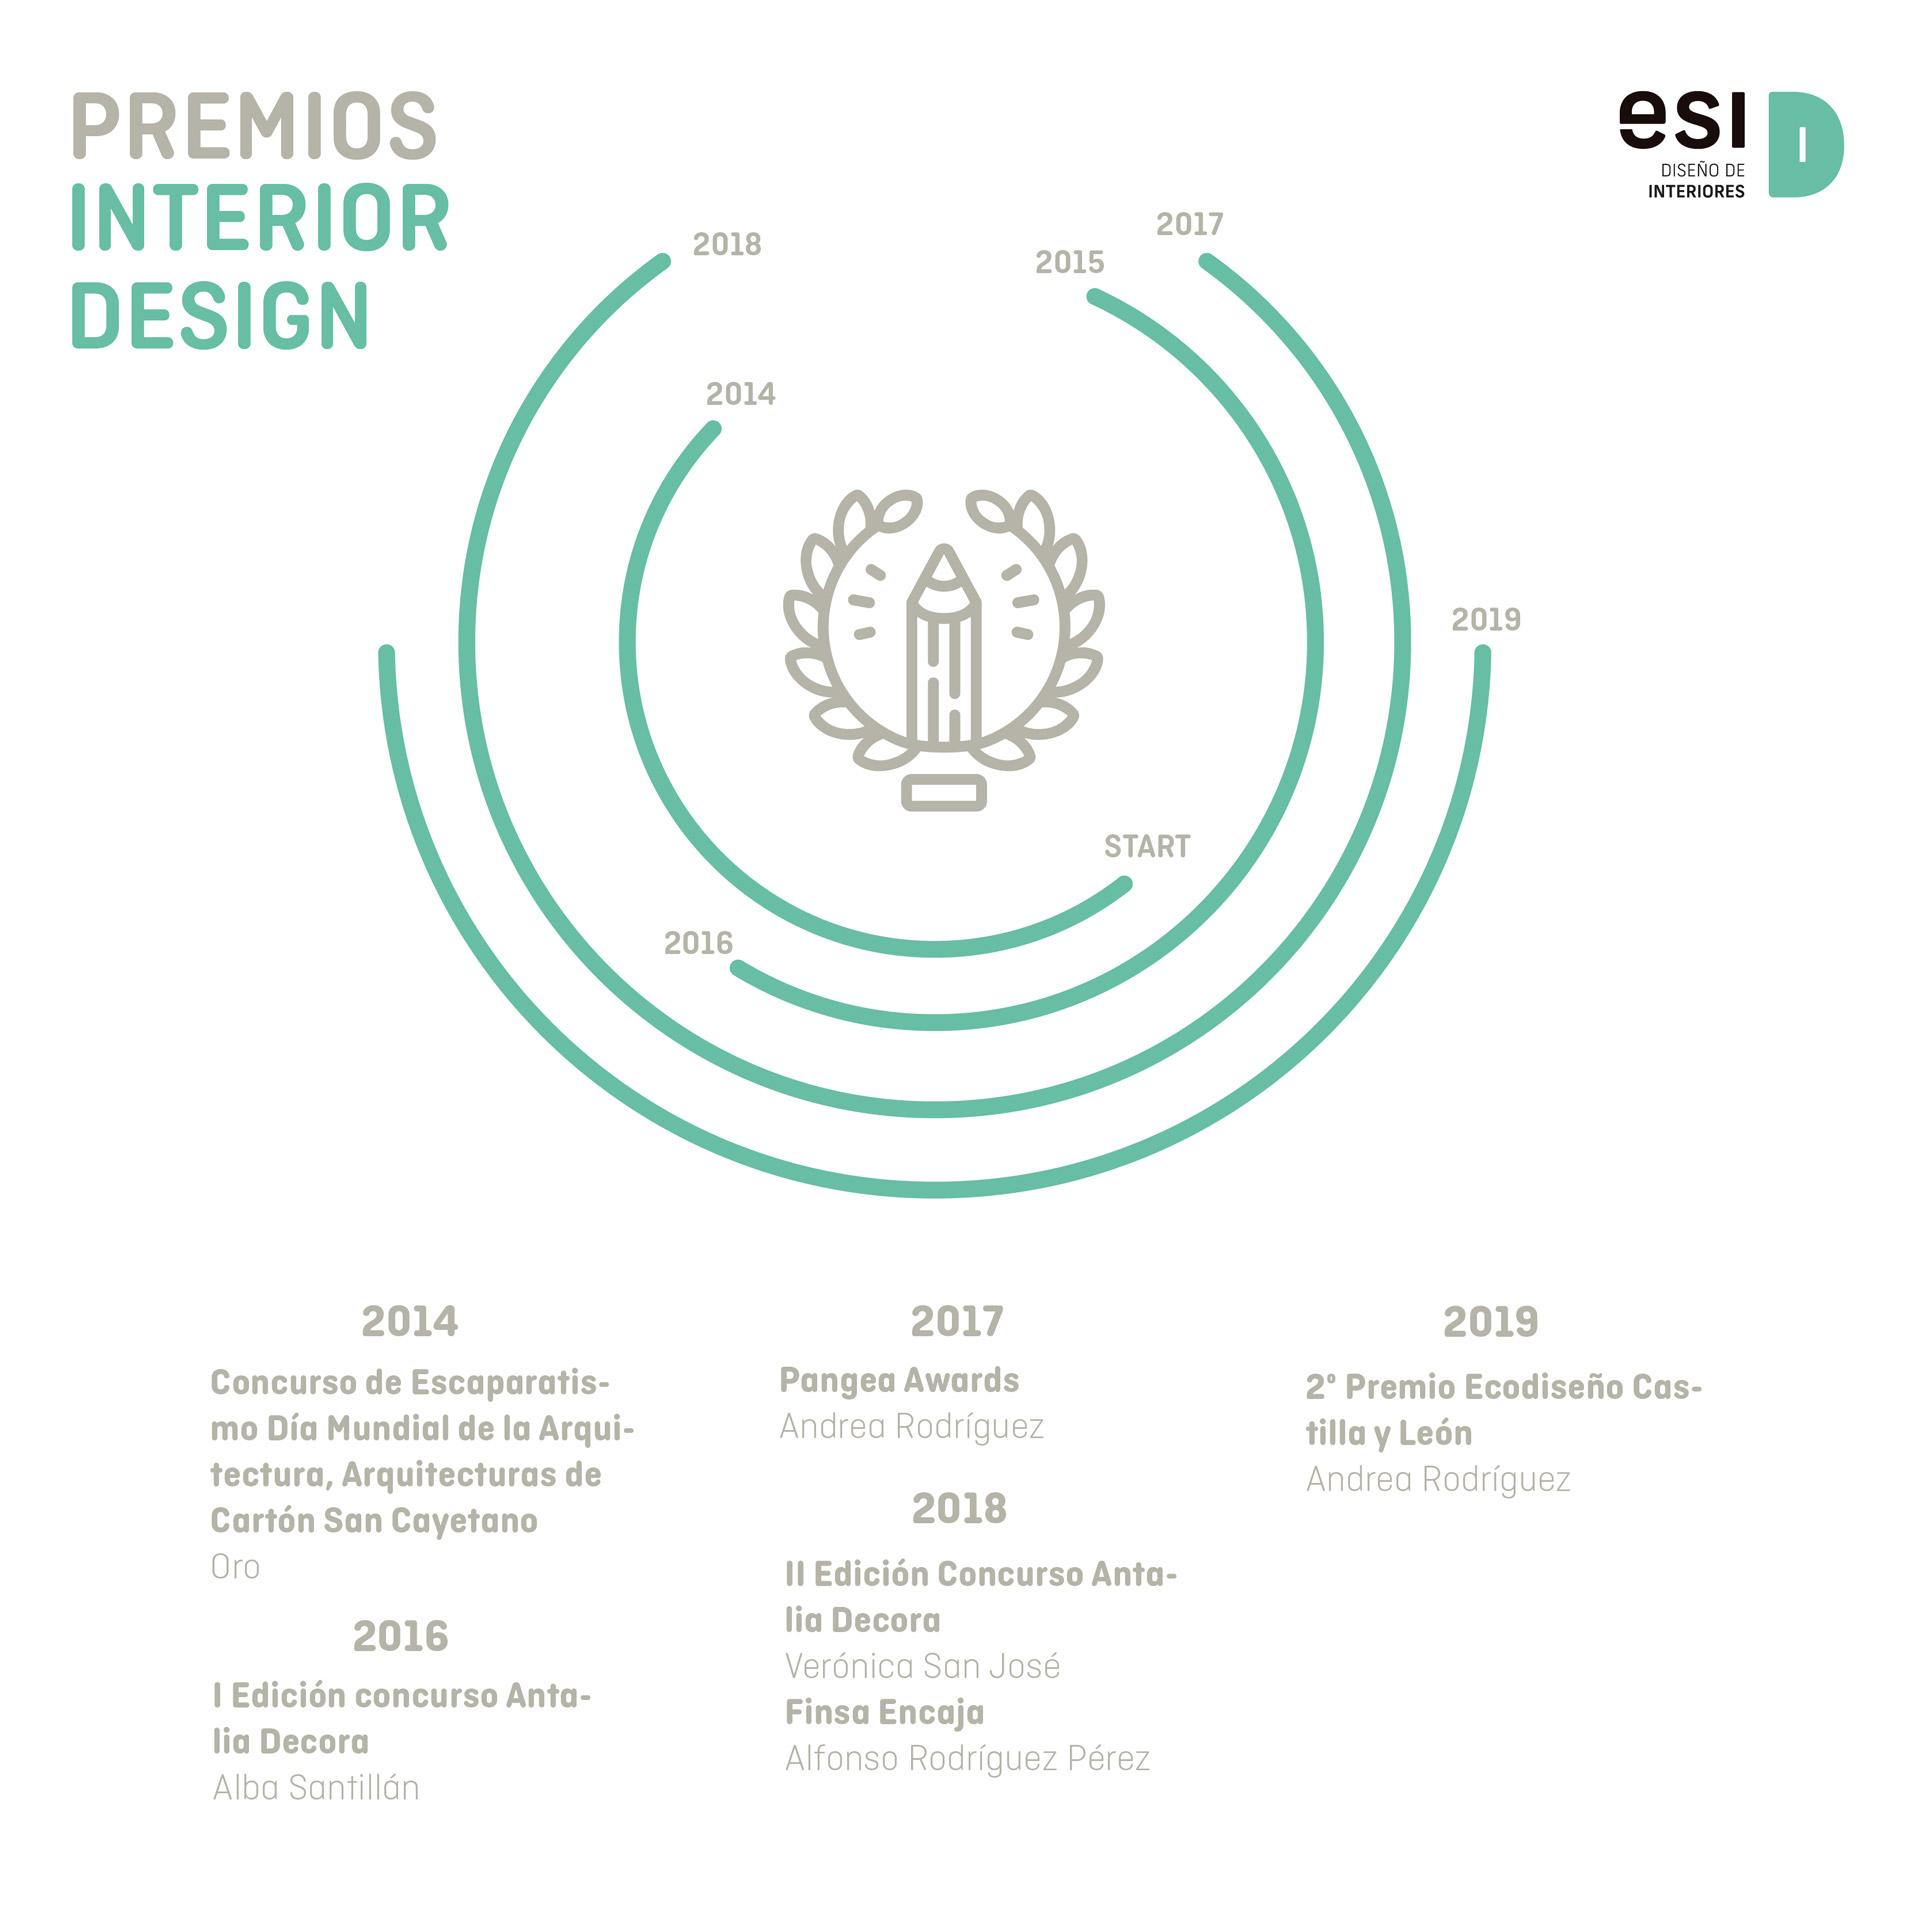 Premios Interior Design Detalle